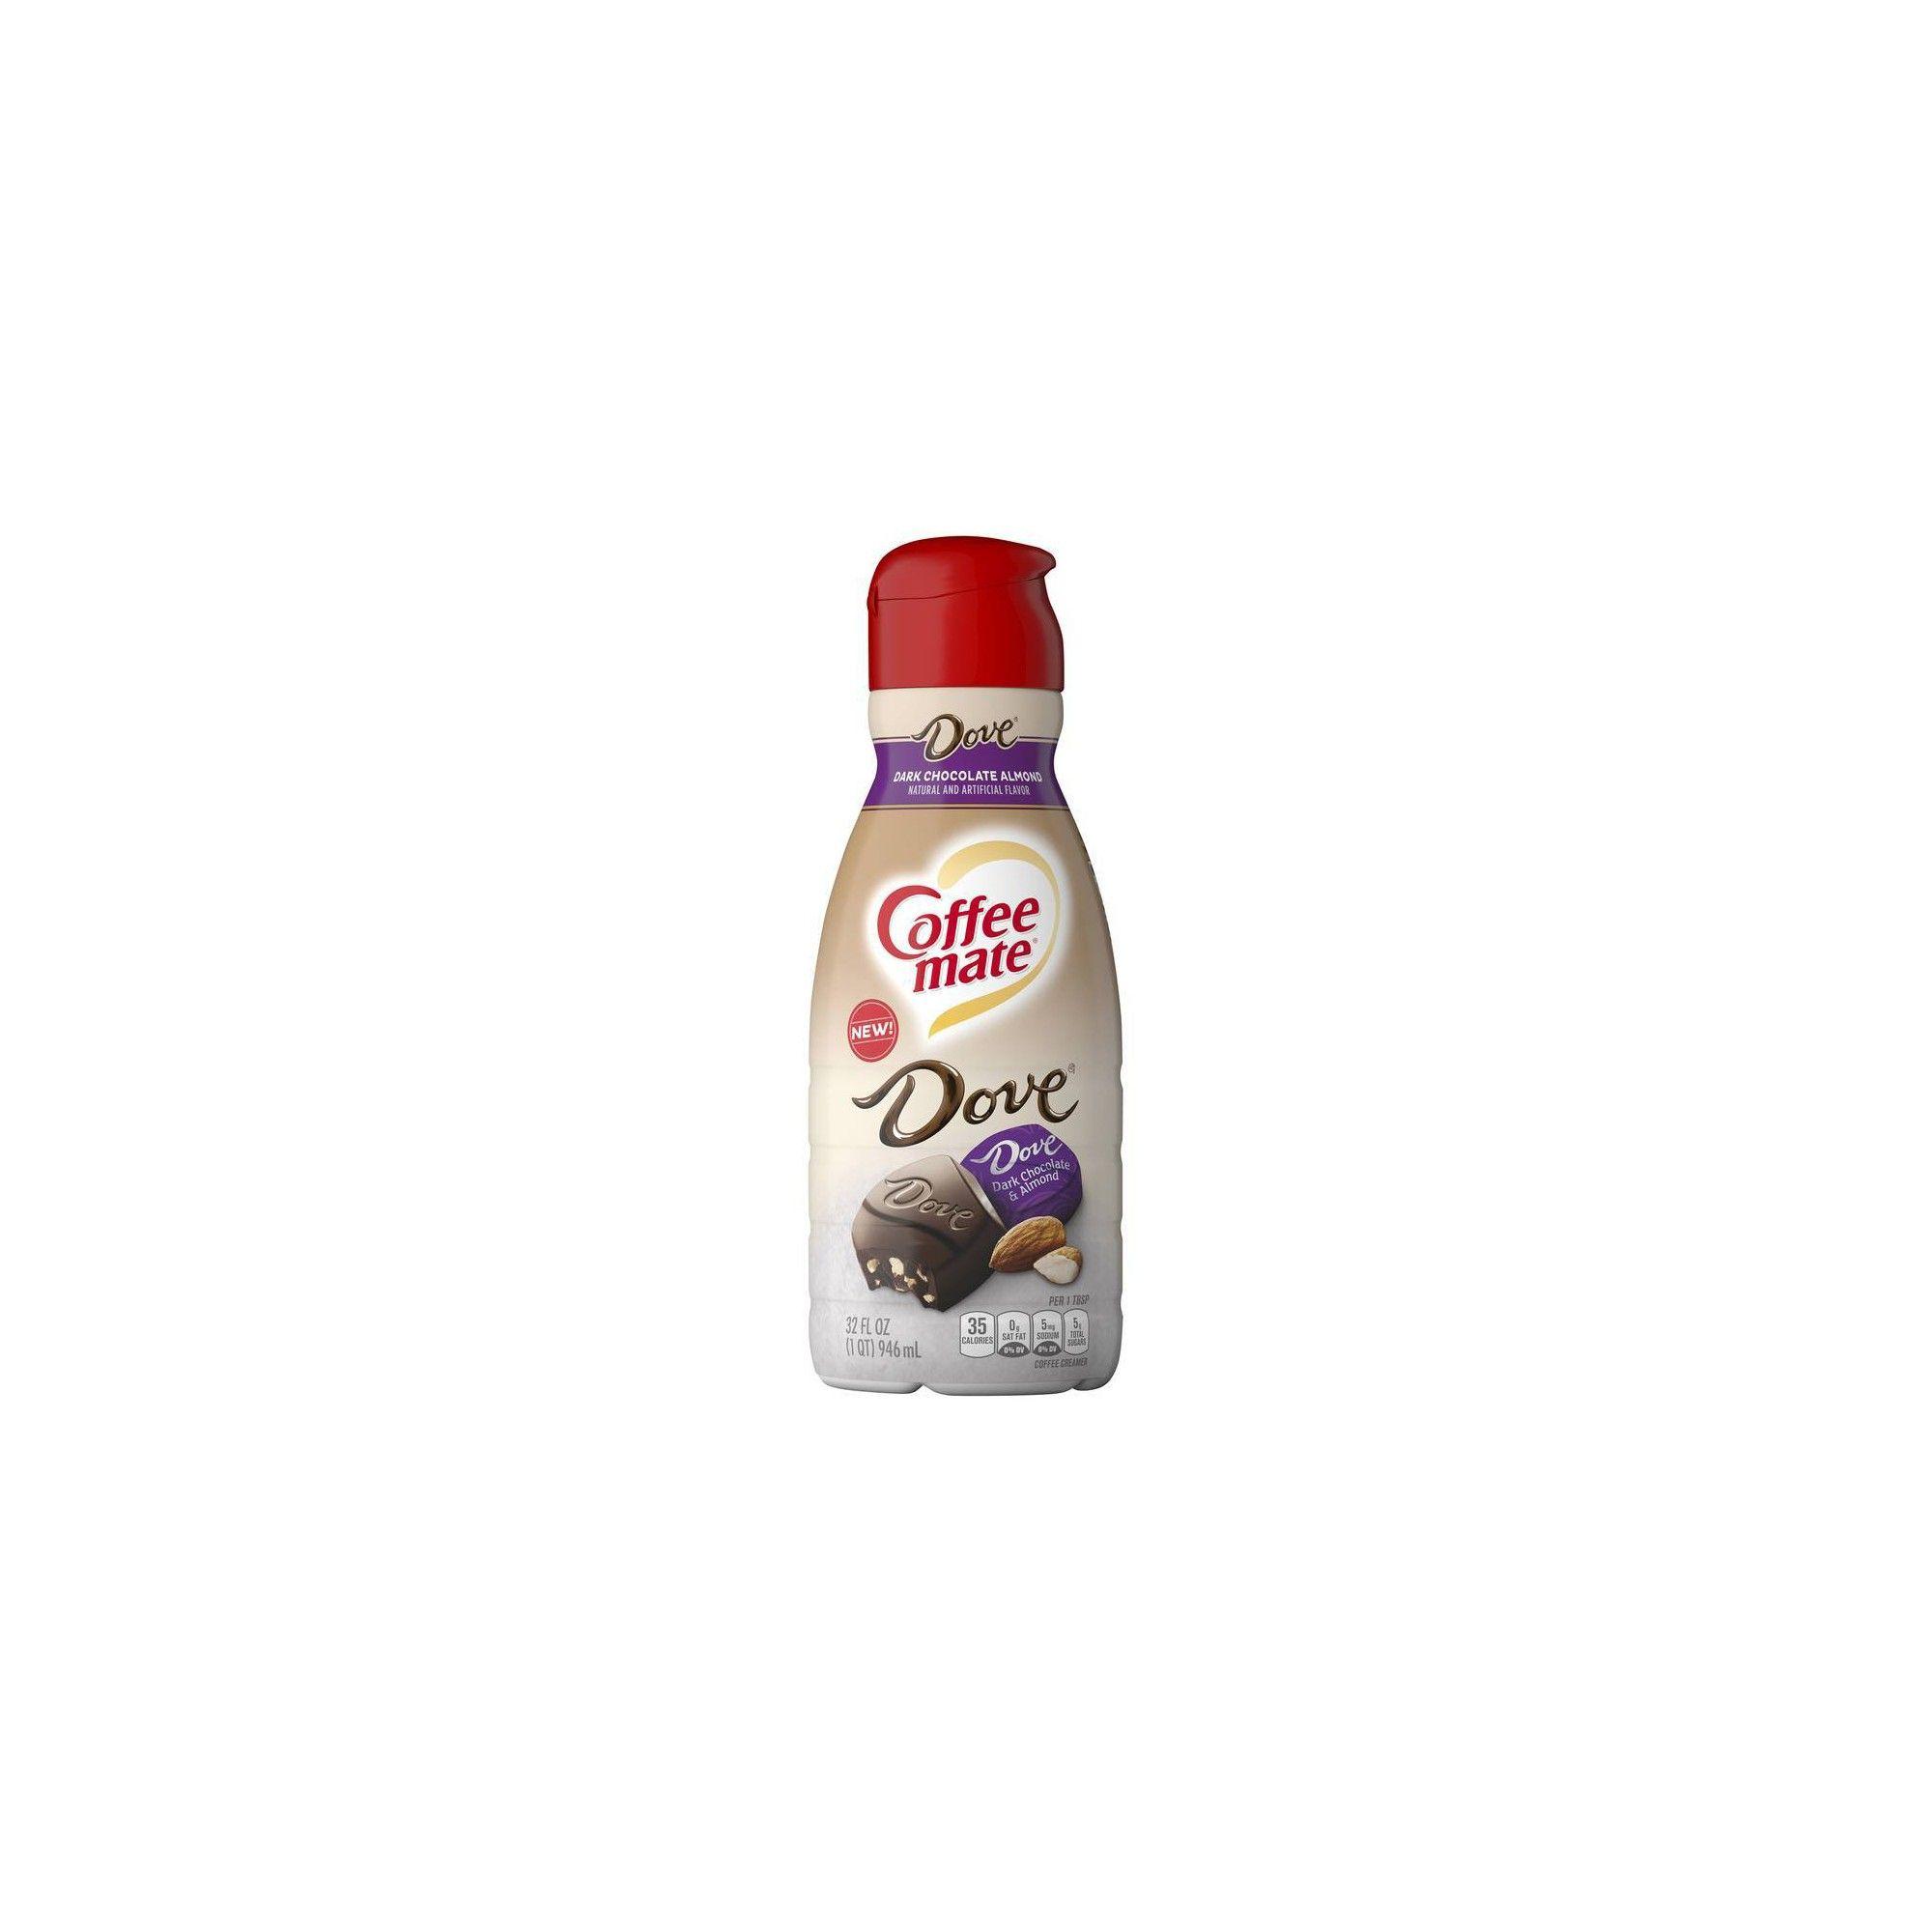 Coffee mate dove dark chocolate almond coffee creamer 32